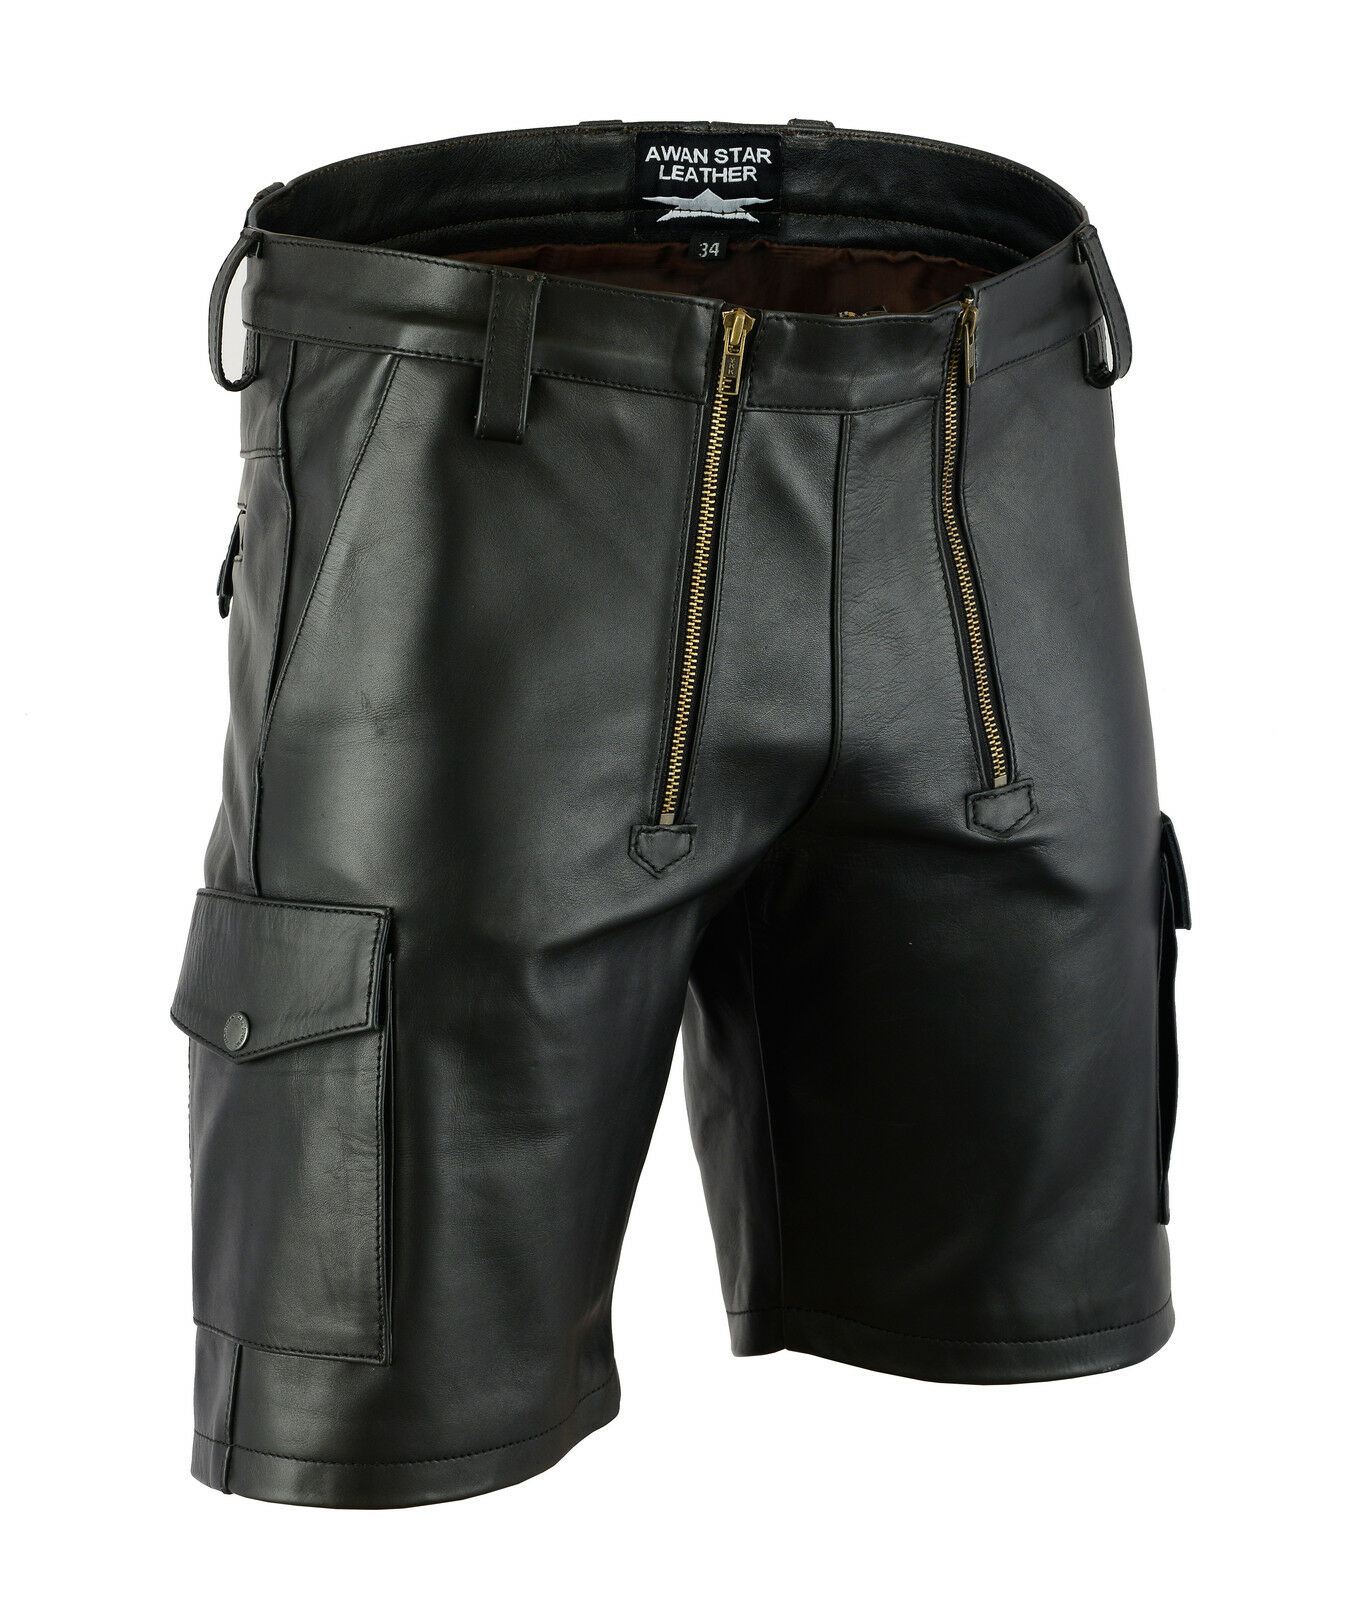 Aw7520 morbida pelle Carpenter Carpenter Carpenter Pantaloncini, Pantaloni corti con tasconi, Zimmermann tubo flessibile, Pantaloni Cargo 9b1ec0